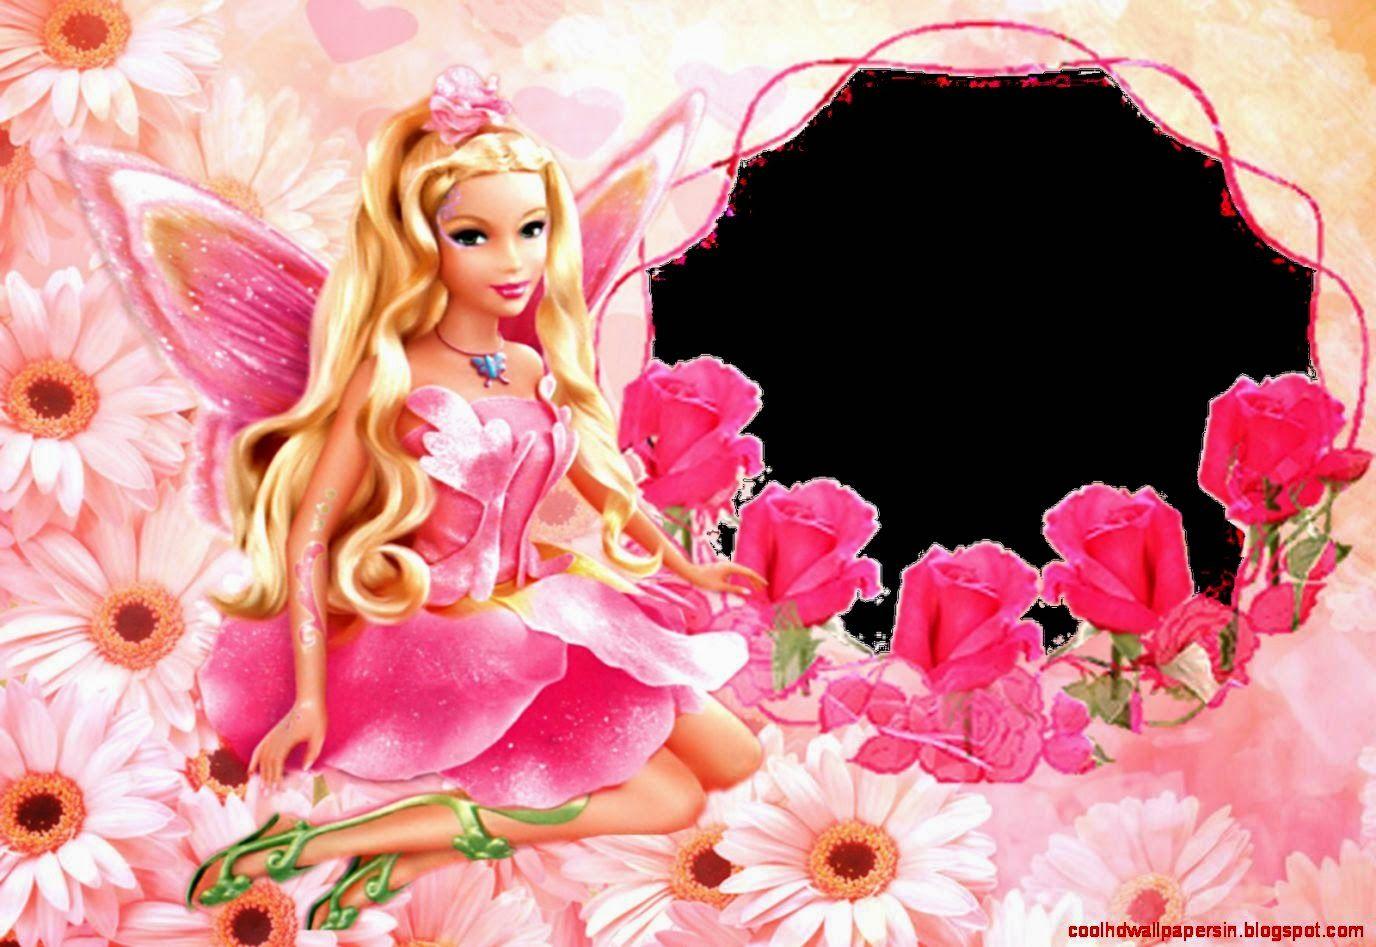 Simple Wallpaper Mobile Barbie - fb618a7c8a54d30bcb12b8effde5b4f9  Picture_268142.jpg